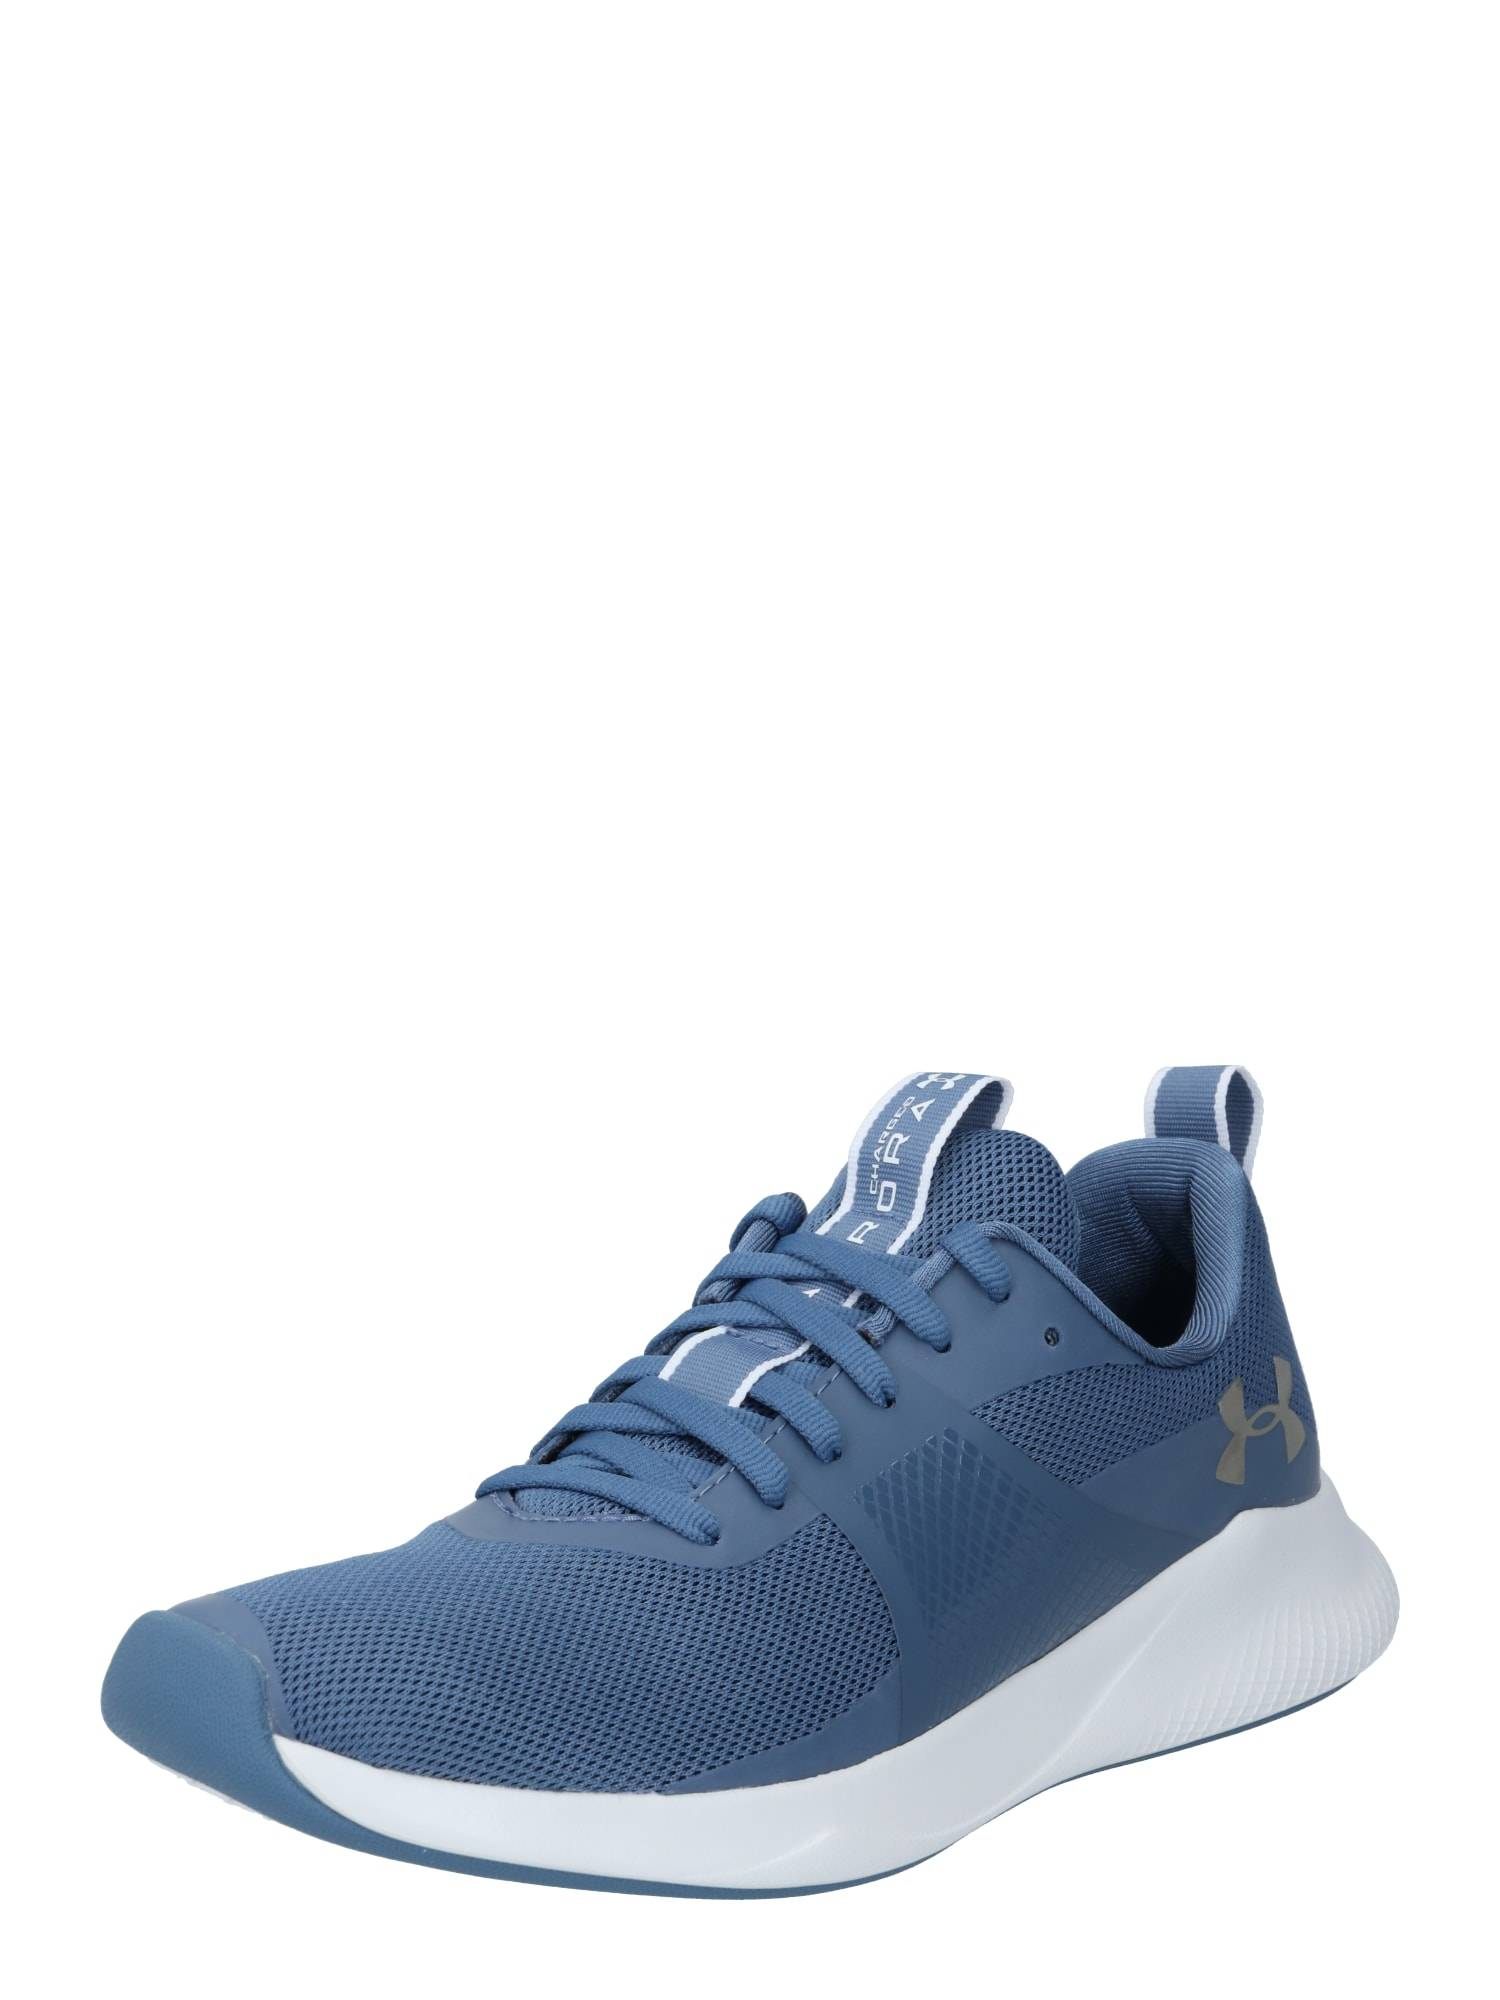 UNDER ARMOUR Chaussure de sport 'Aurora'  - Bleu - Taille: 6 - female